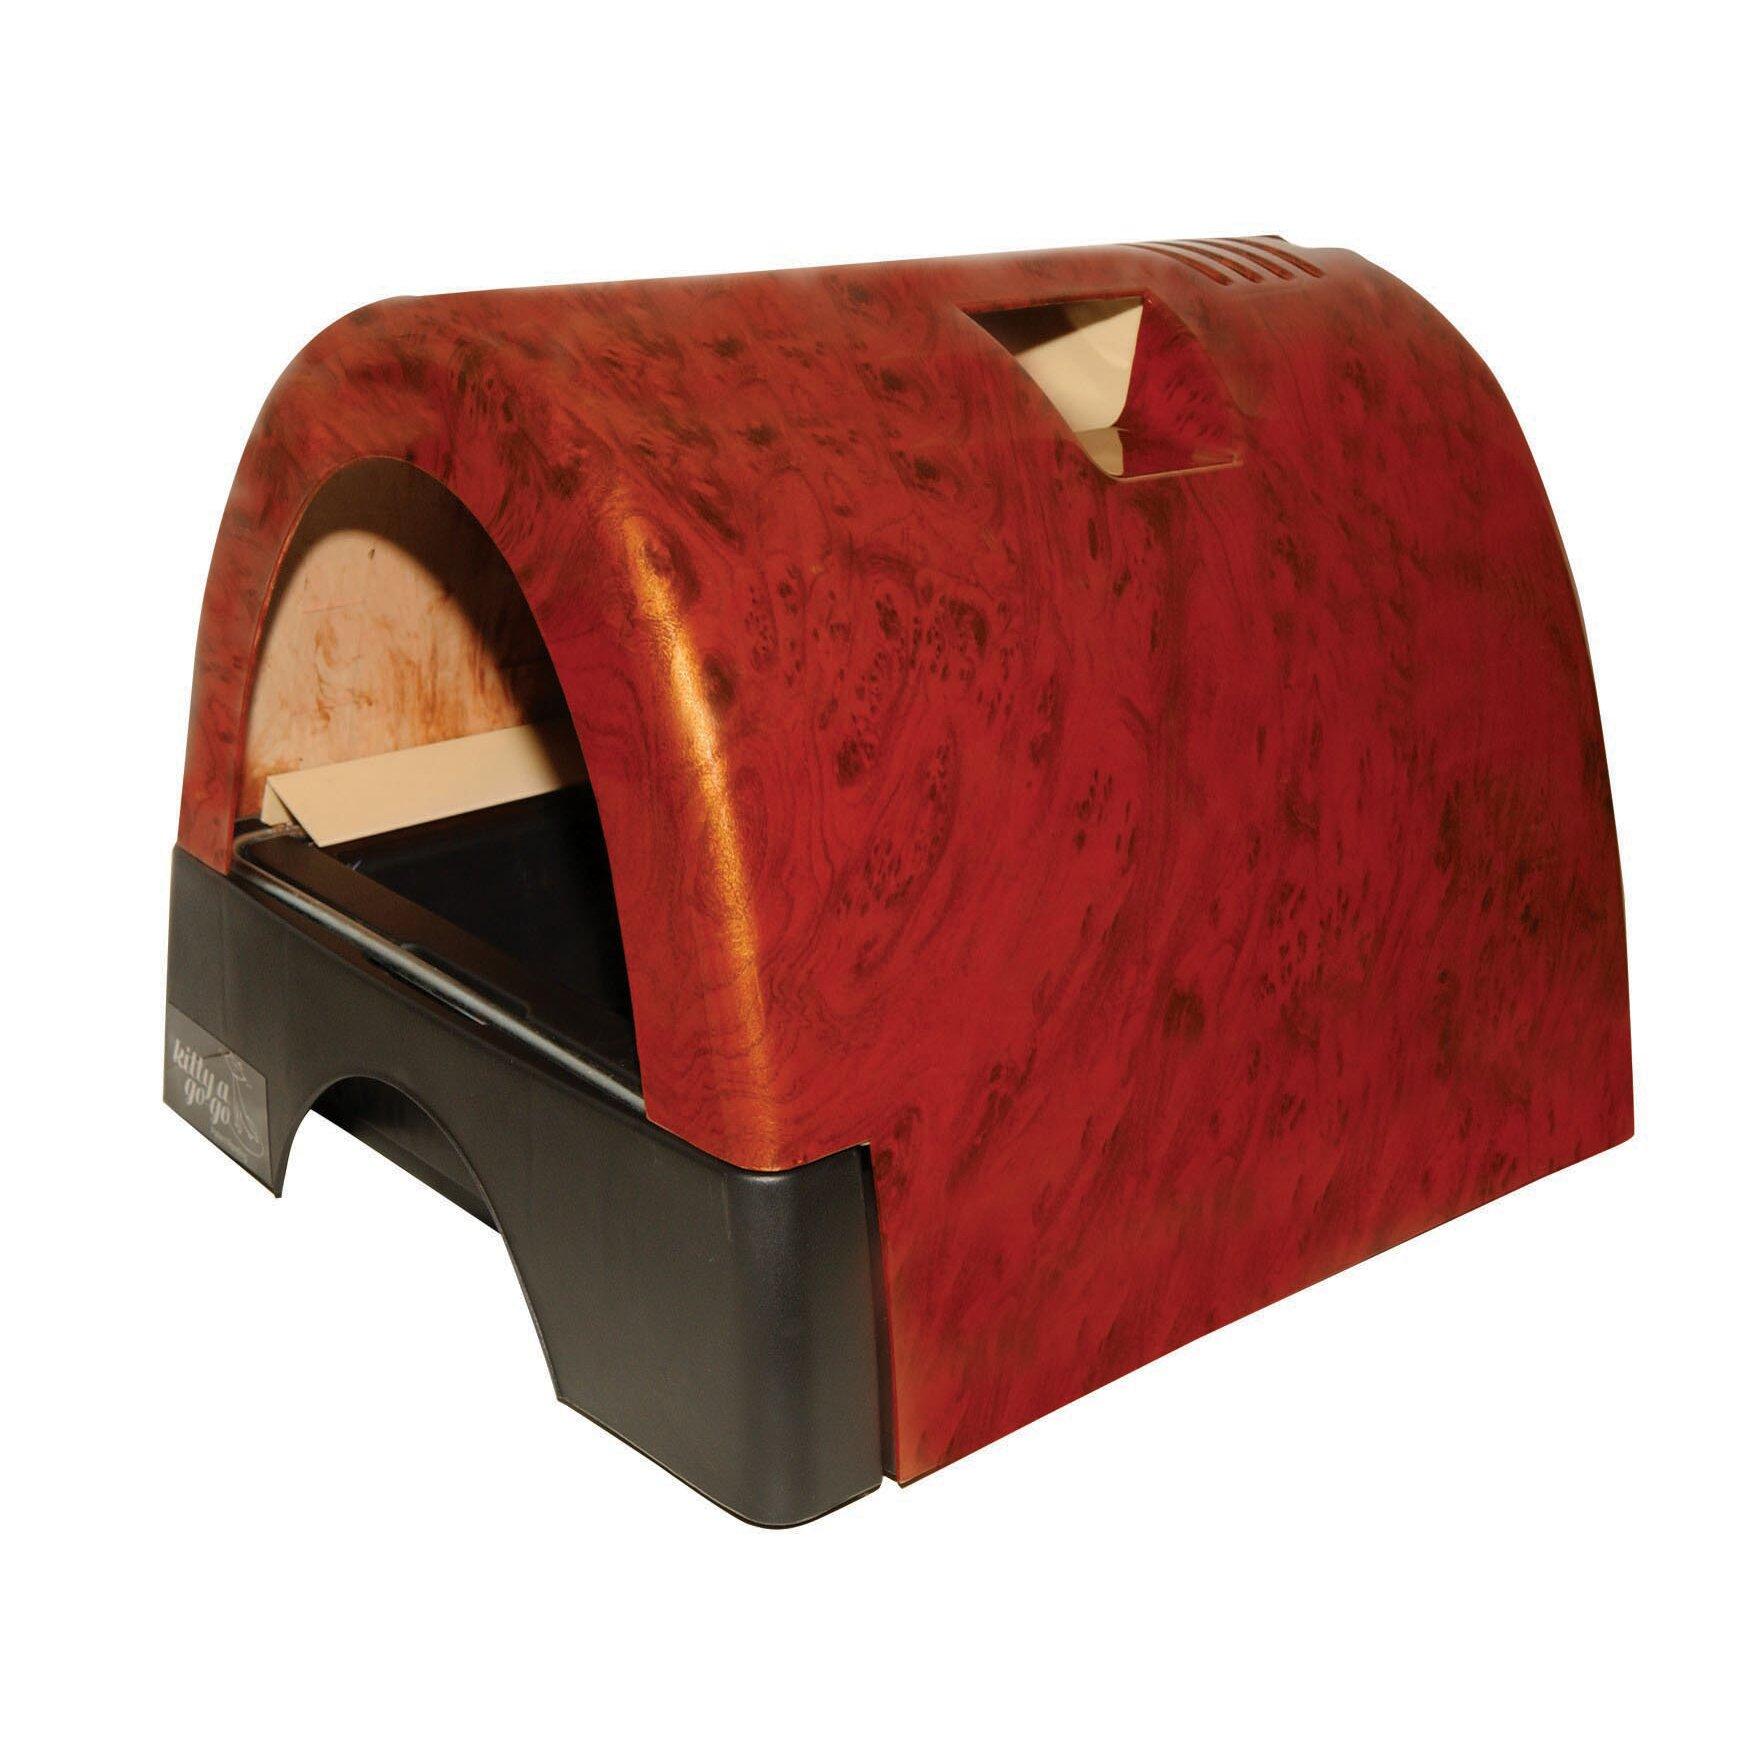 Kittyagogo Designer Cat Litter Box With Burl Wood Cover